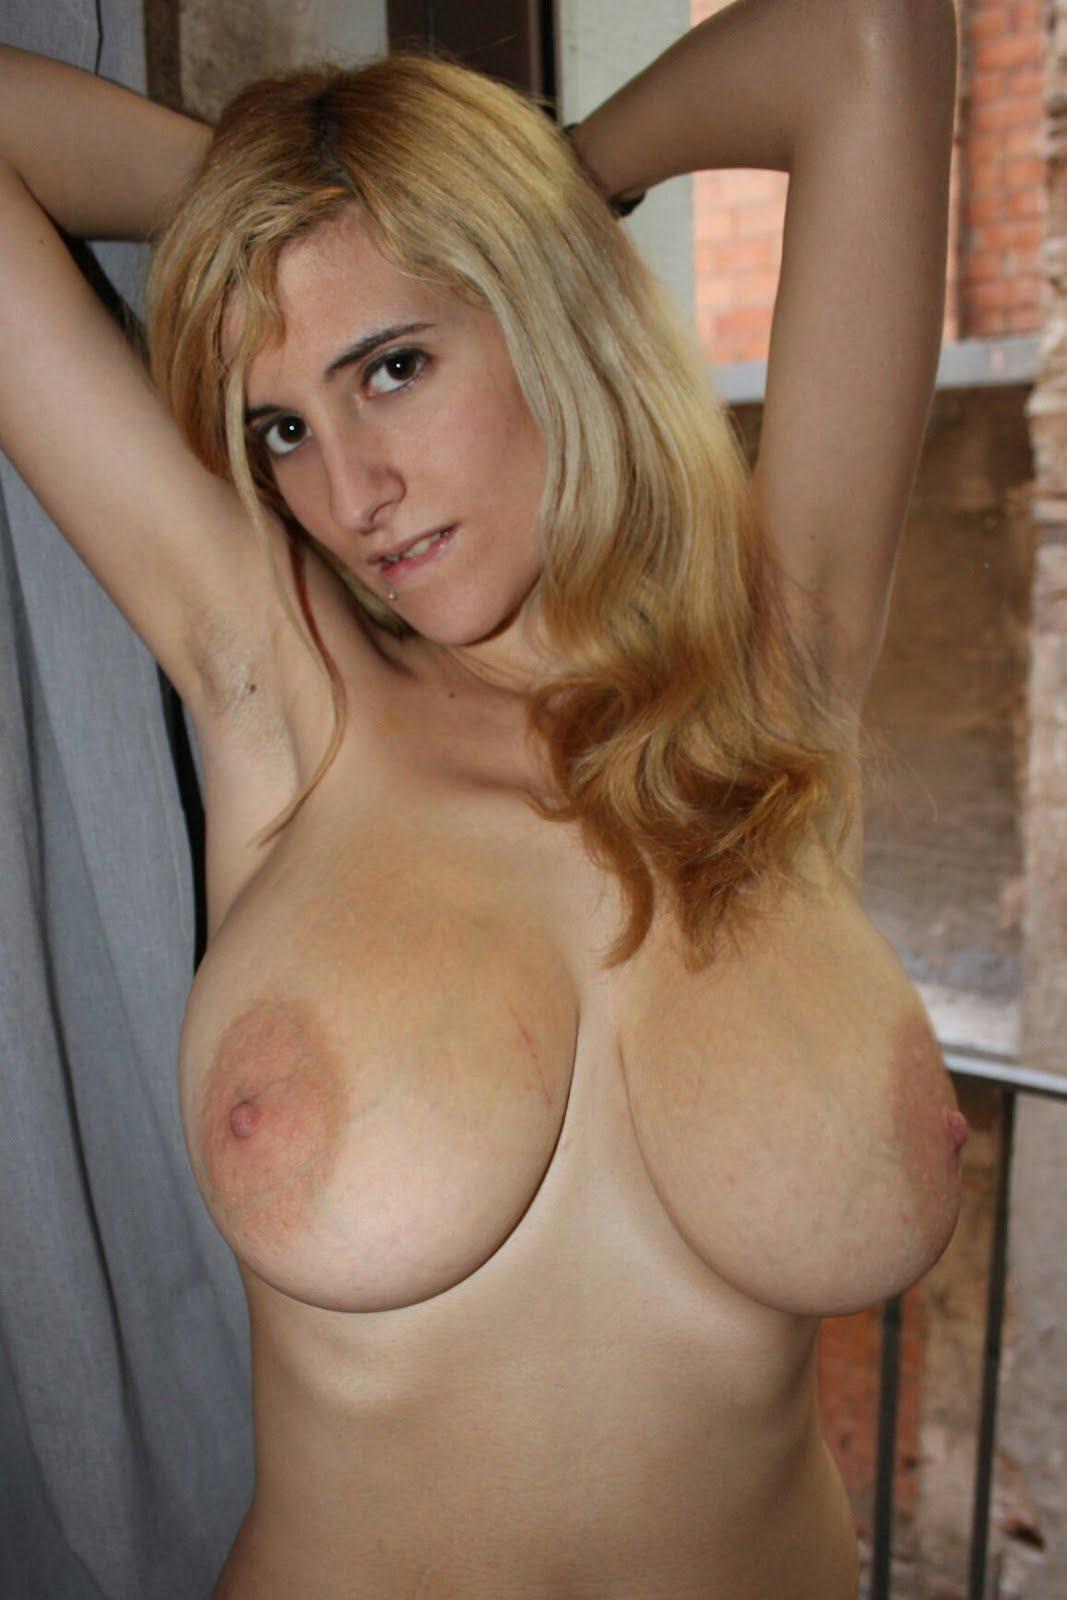 Lindsay lohan sex scene stream